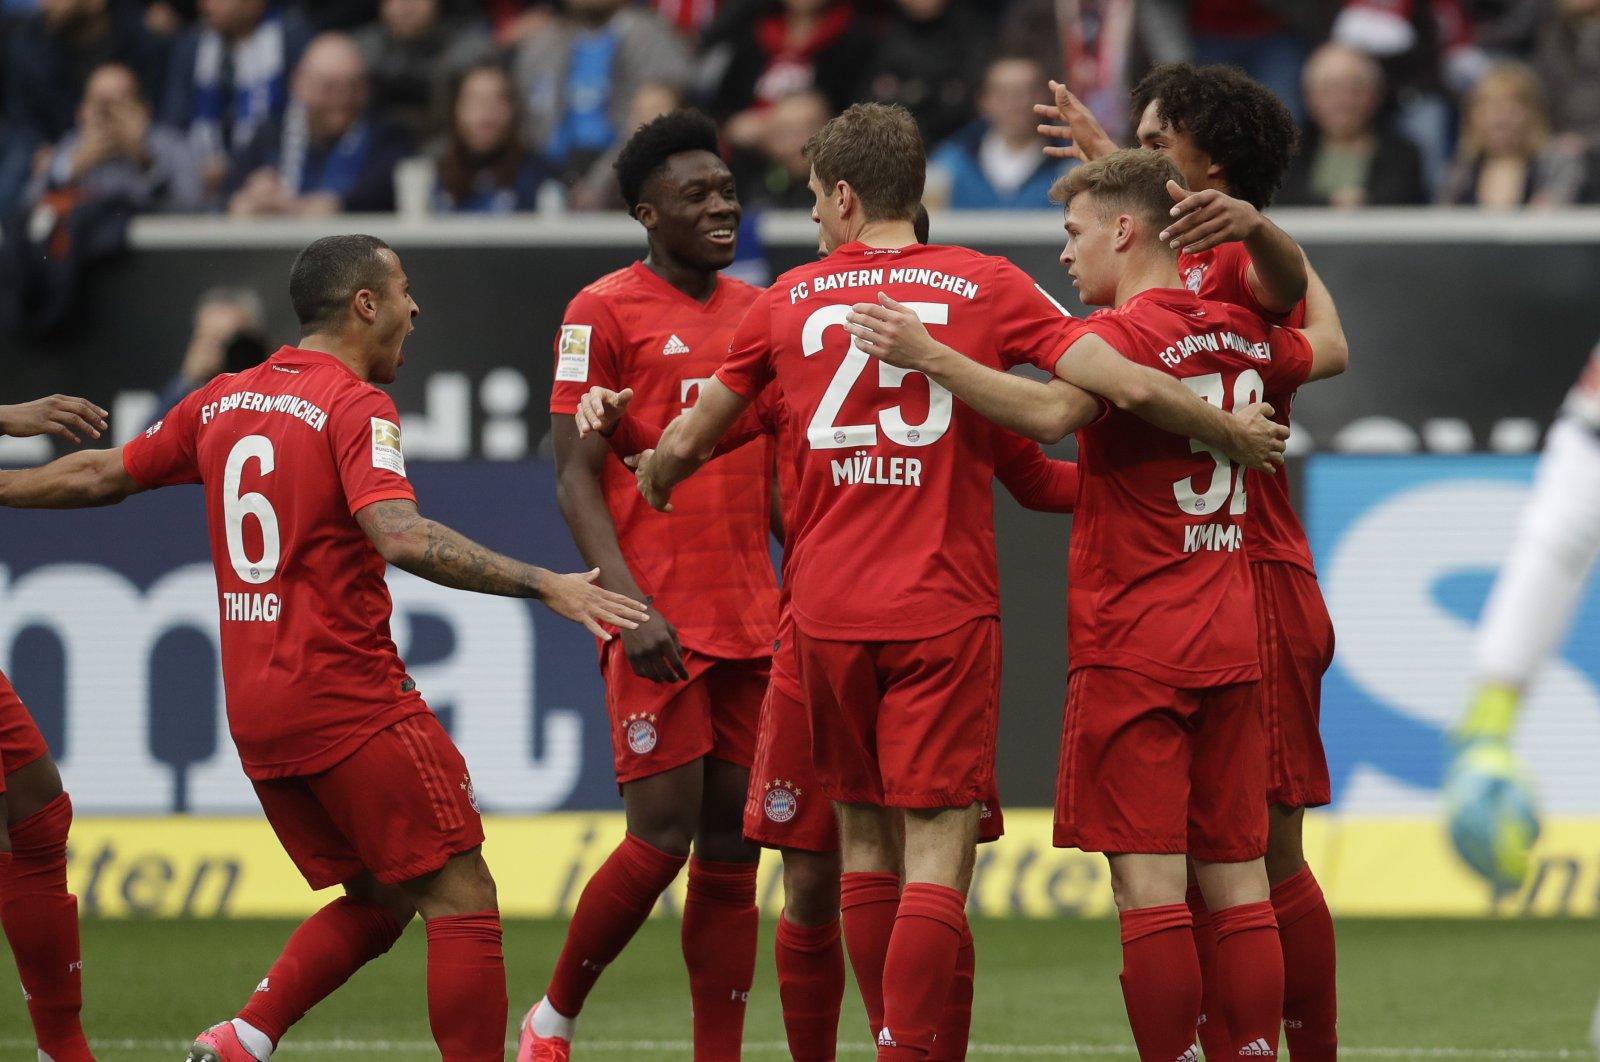 Bayern's players celebrate after a goal during a Bundesliga match against TSG 1899 Hoffenheim in Sinsheim, Germany, Feb. 29, 2020. (AP Photo)